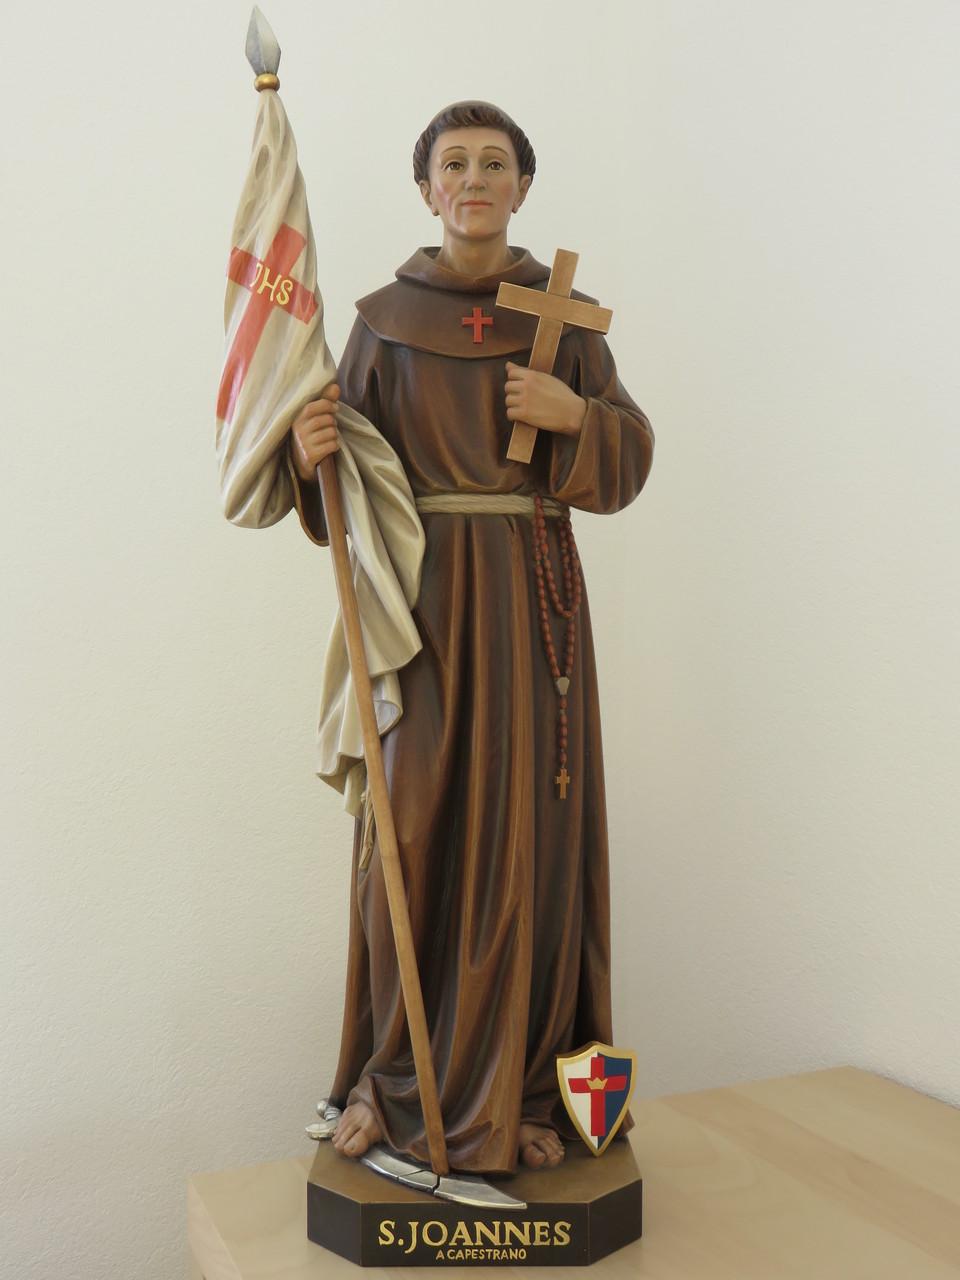 Unsere fünfte Patronatsstatue: Der hl. Johannes v. Capestrano!